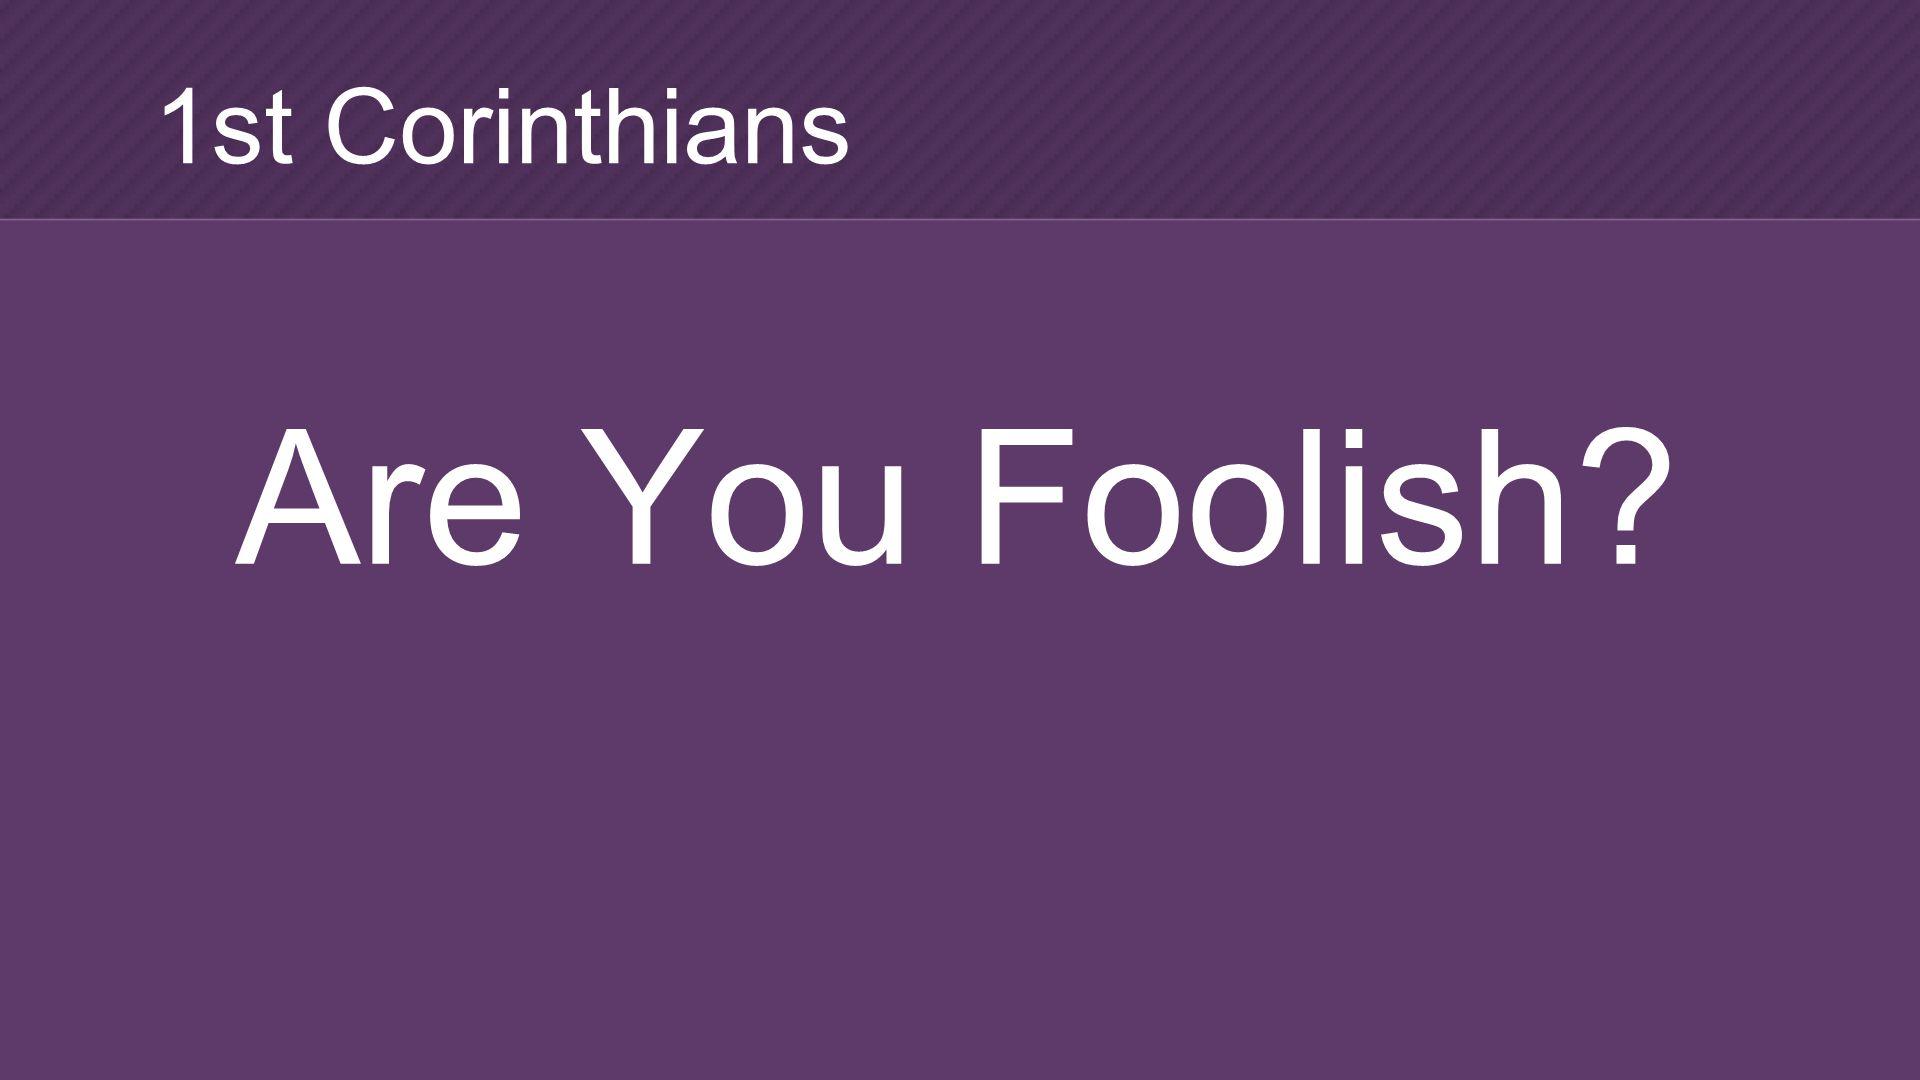 Are You Foolish? 1st Corinthians